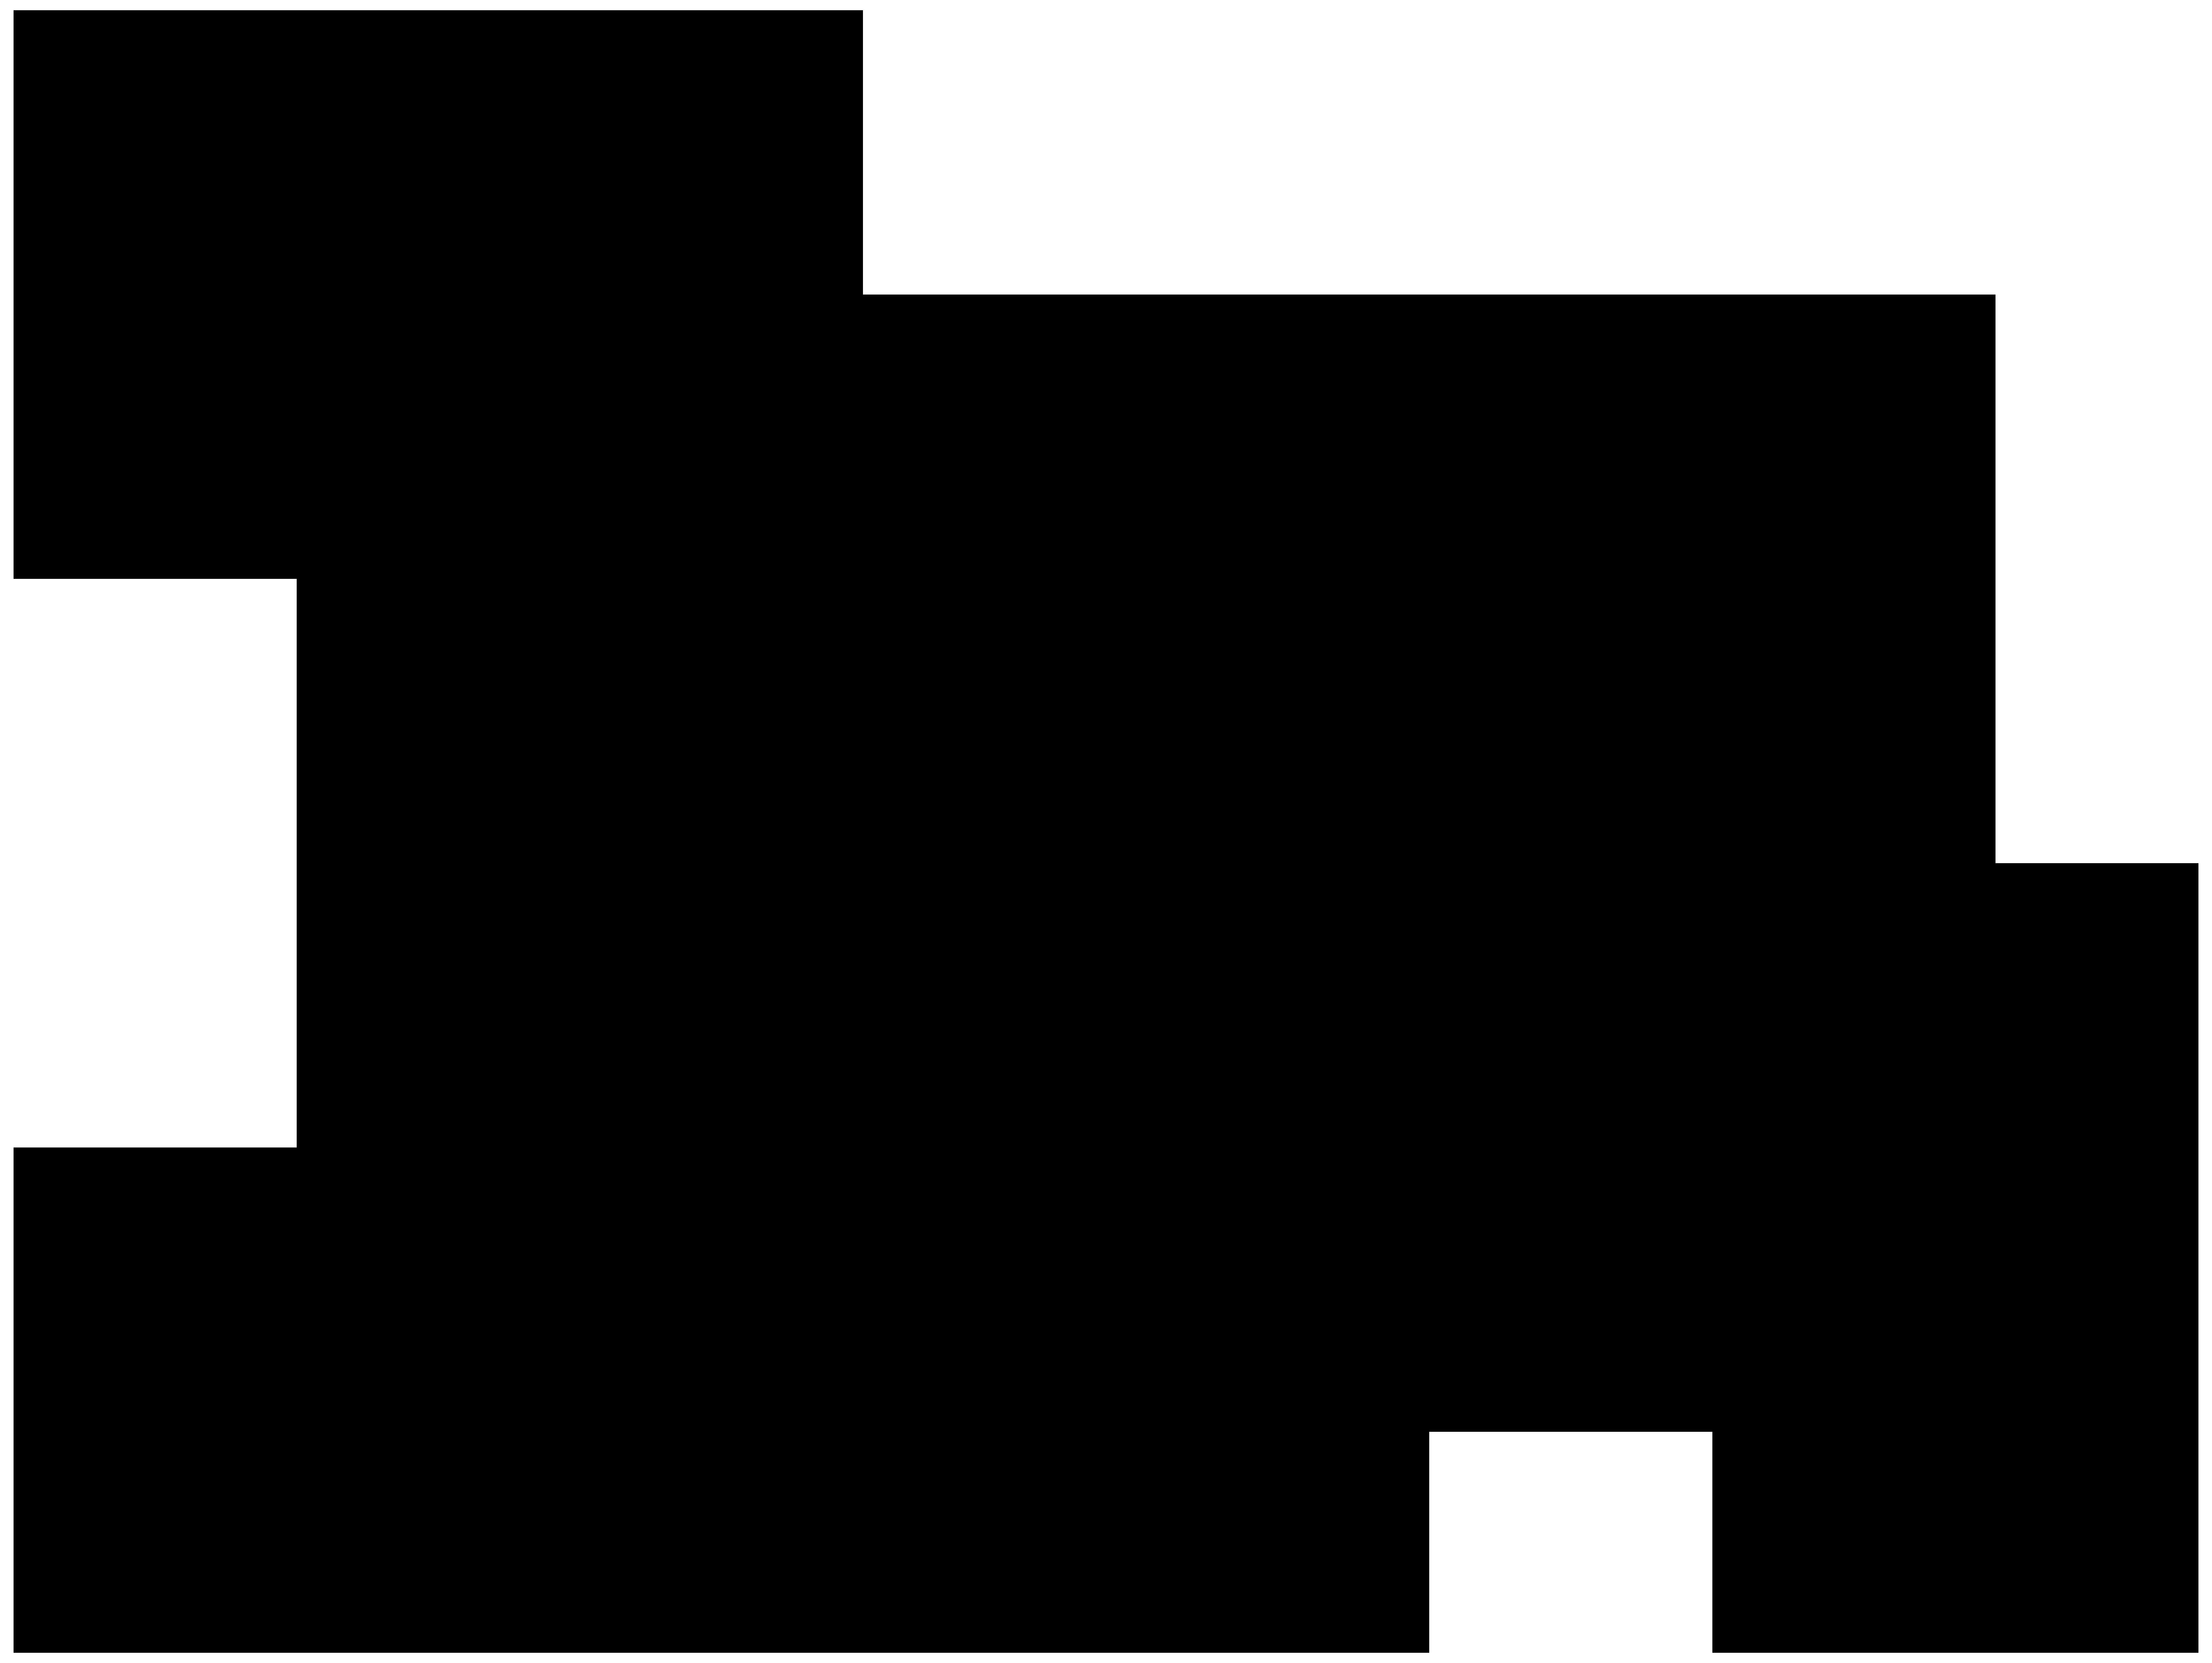 jpg freeuse stock Horse clipart silhouette